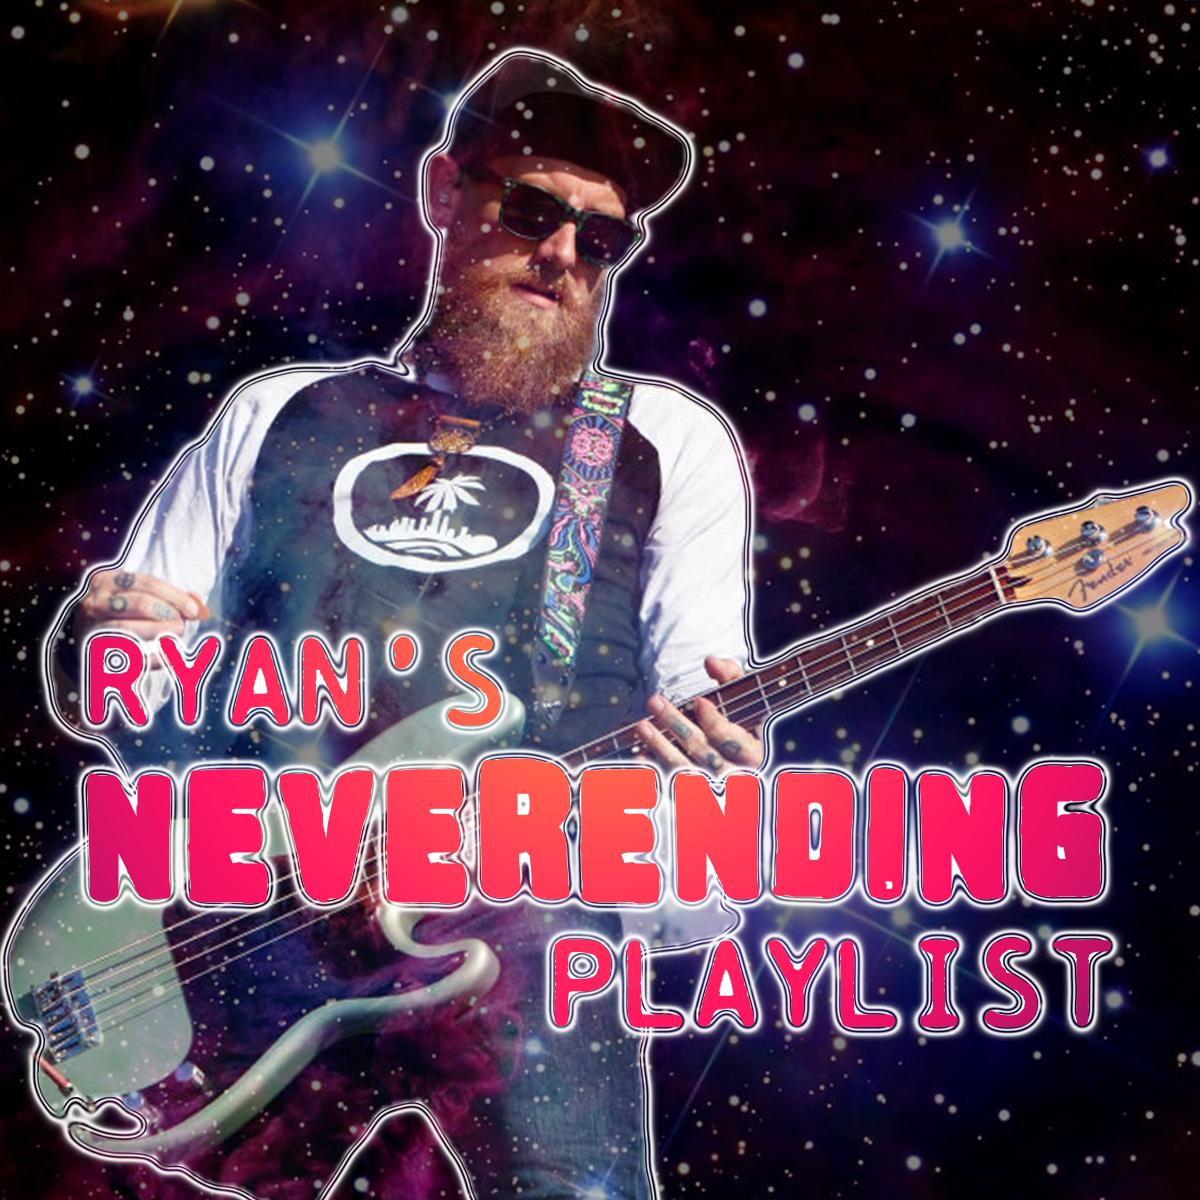 Ryan's NeverEnding Playlist